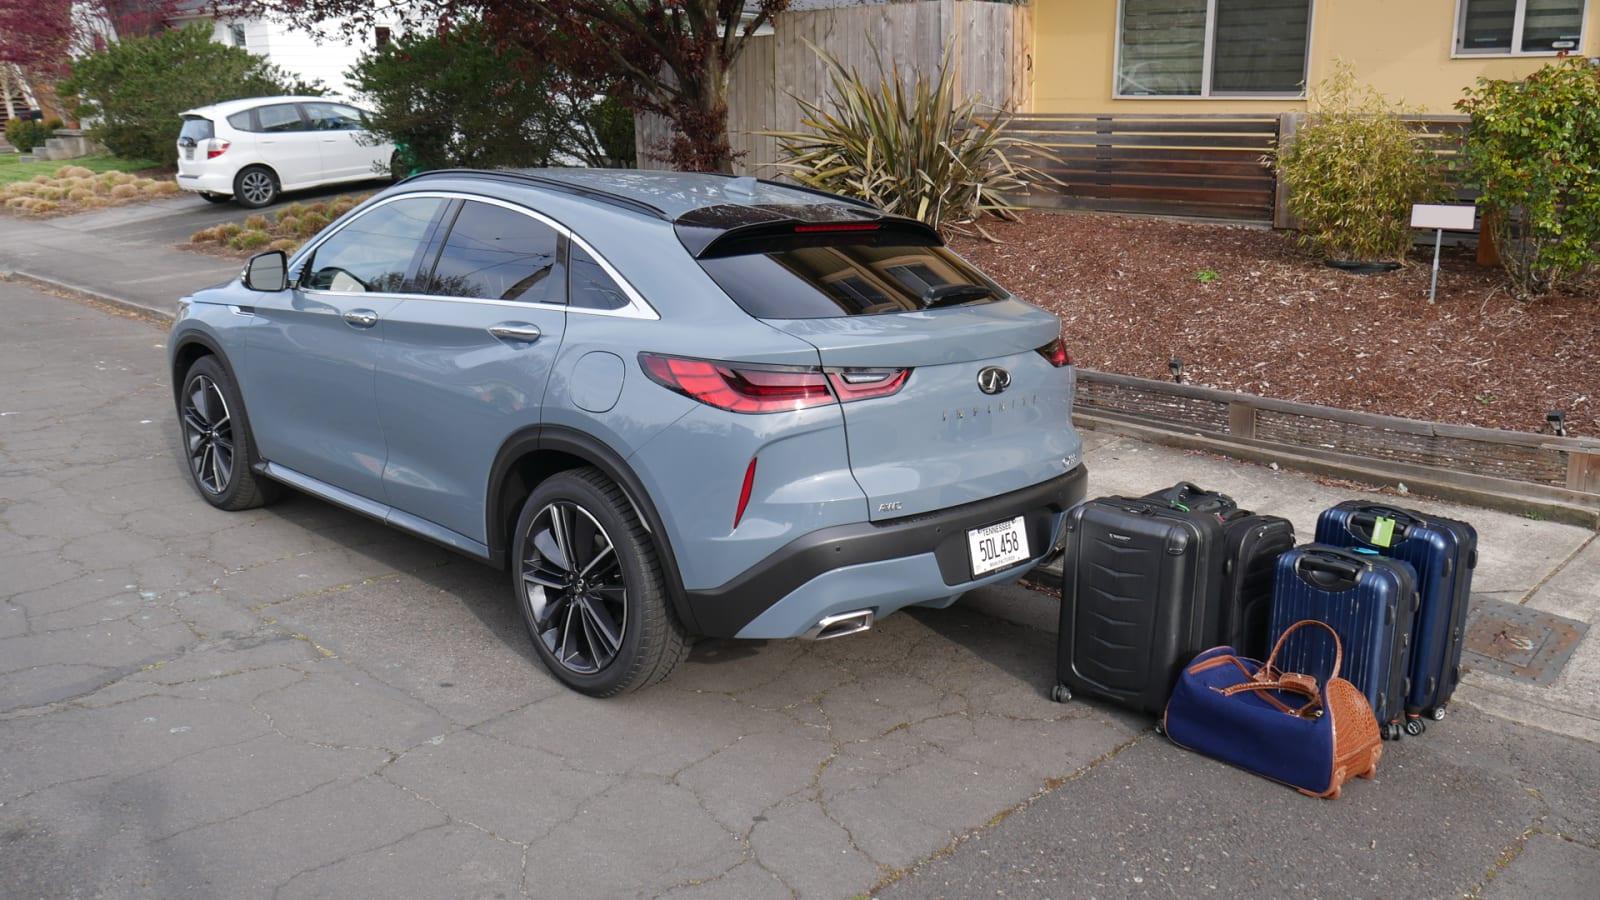 2021 Infiniti QX55 Luggage Test